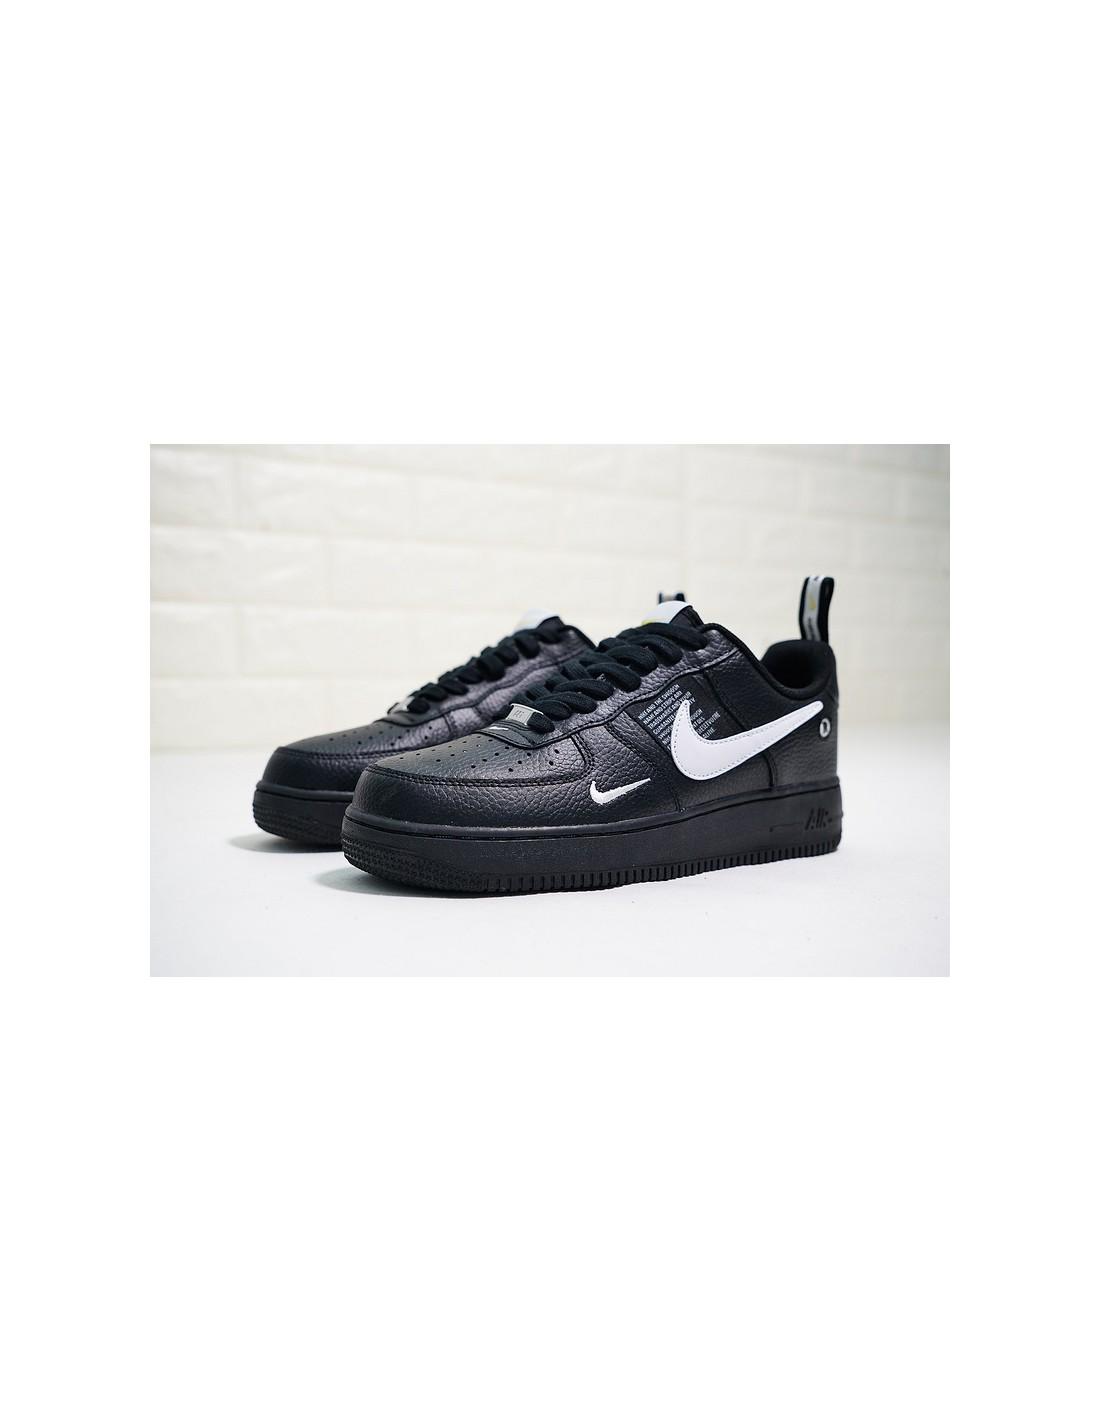 Nike Air Force 1 07 LV8 Utility Pack Men's Shoe